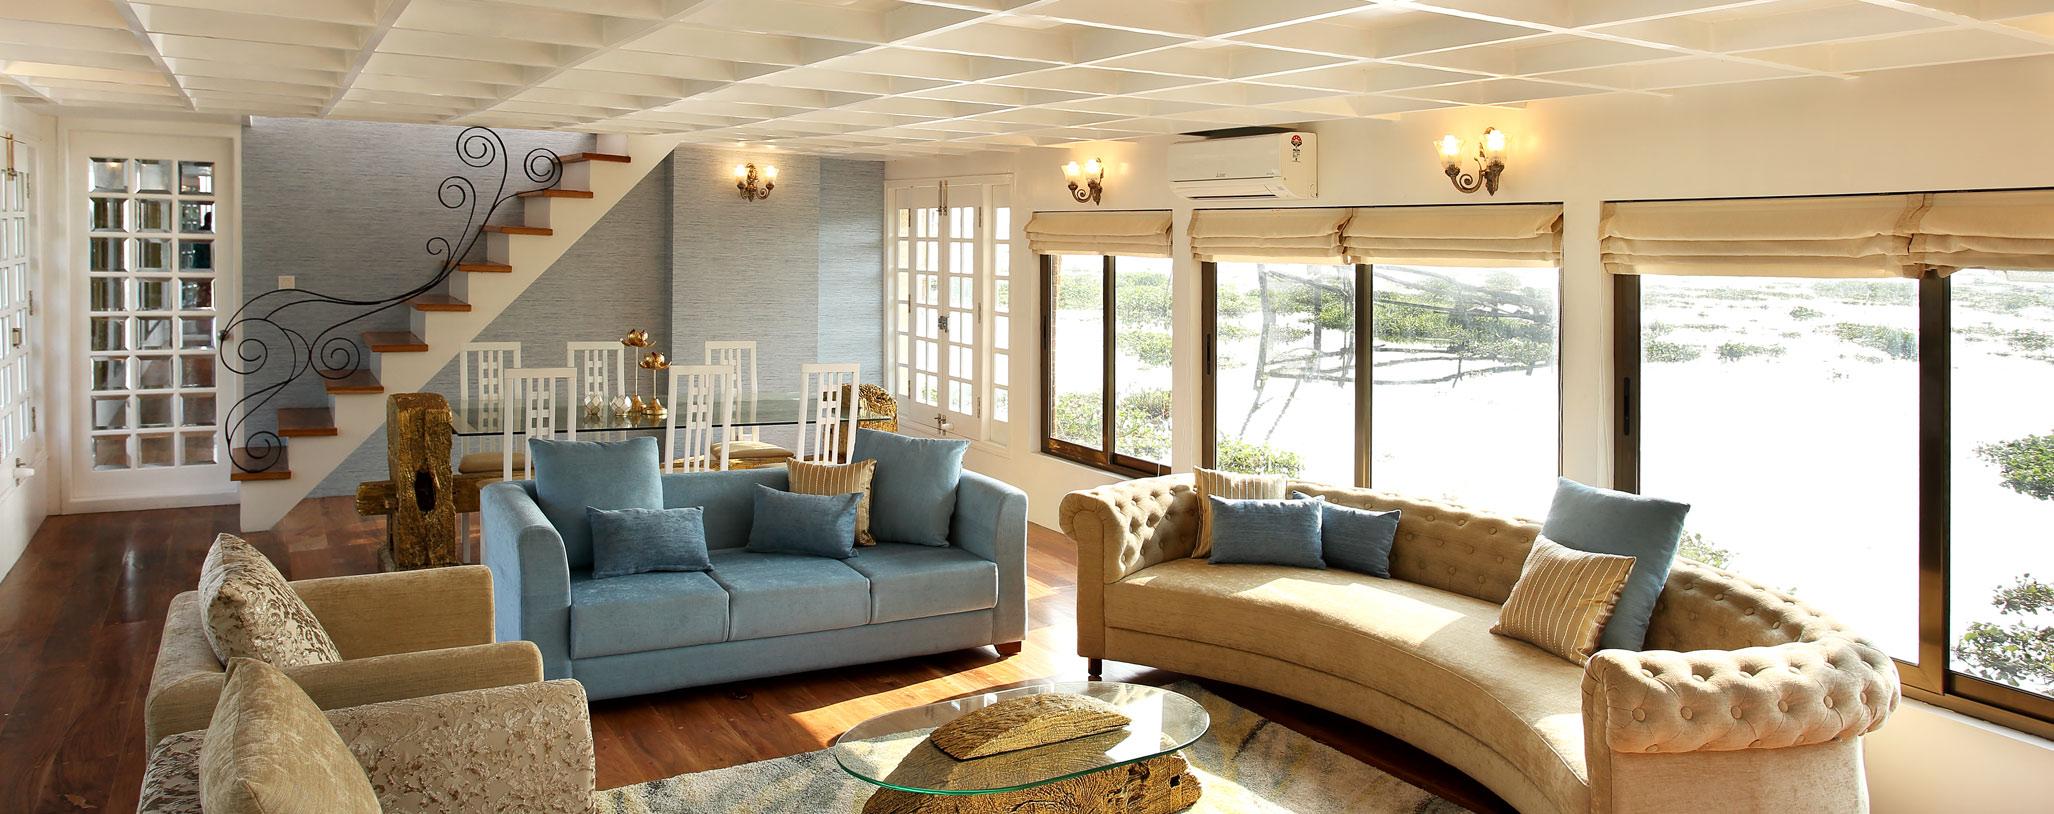 leia-cruise-interior